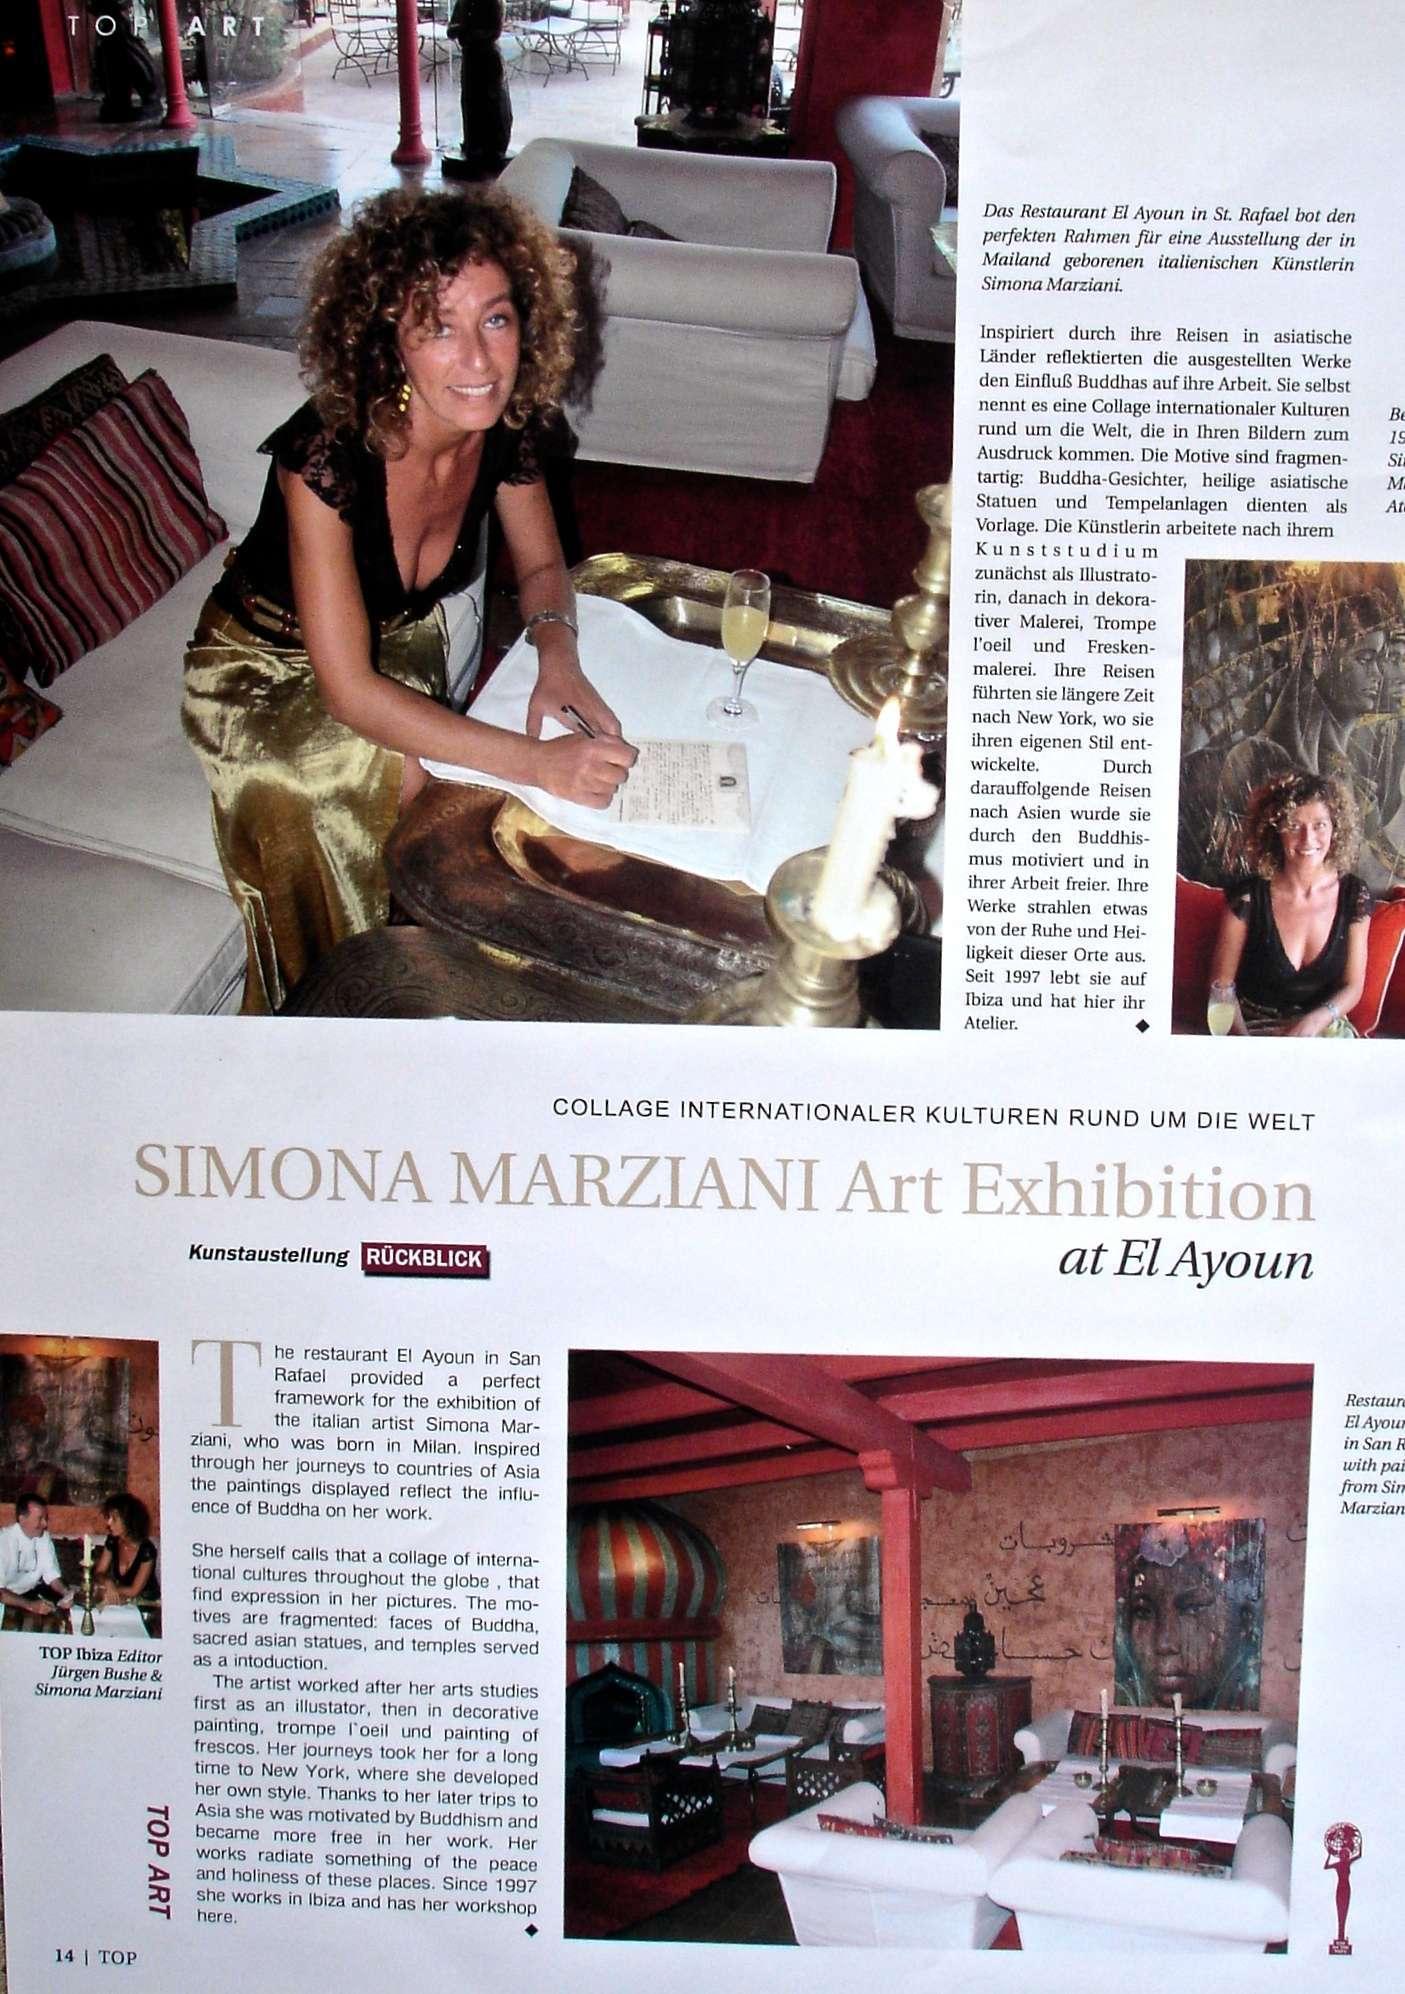 Press El Ayoun - SIMONA MARZIANI